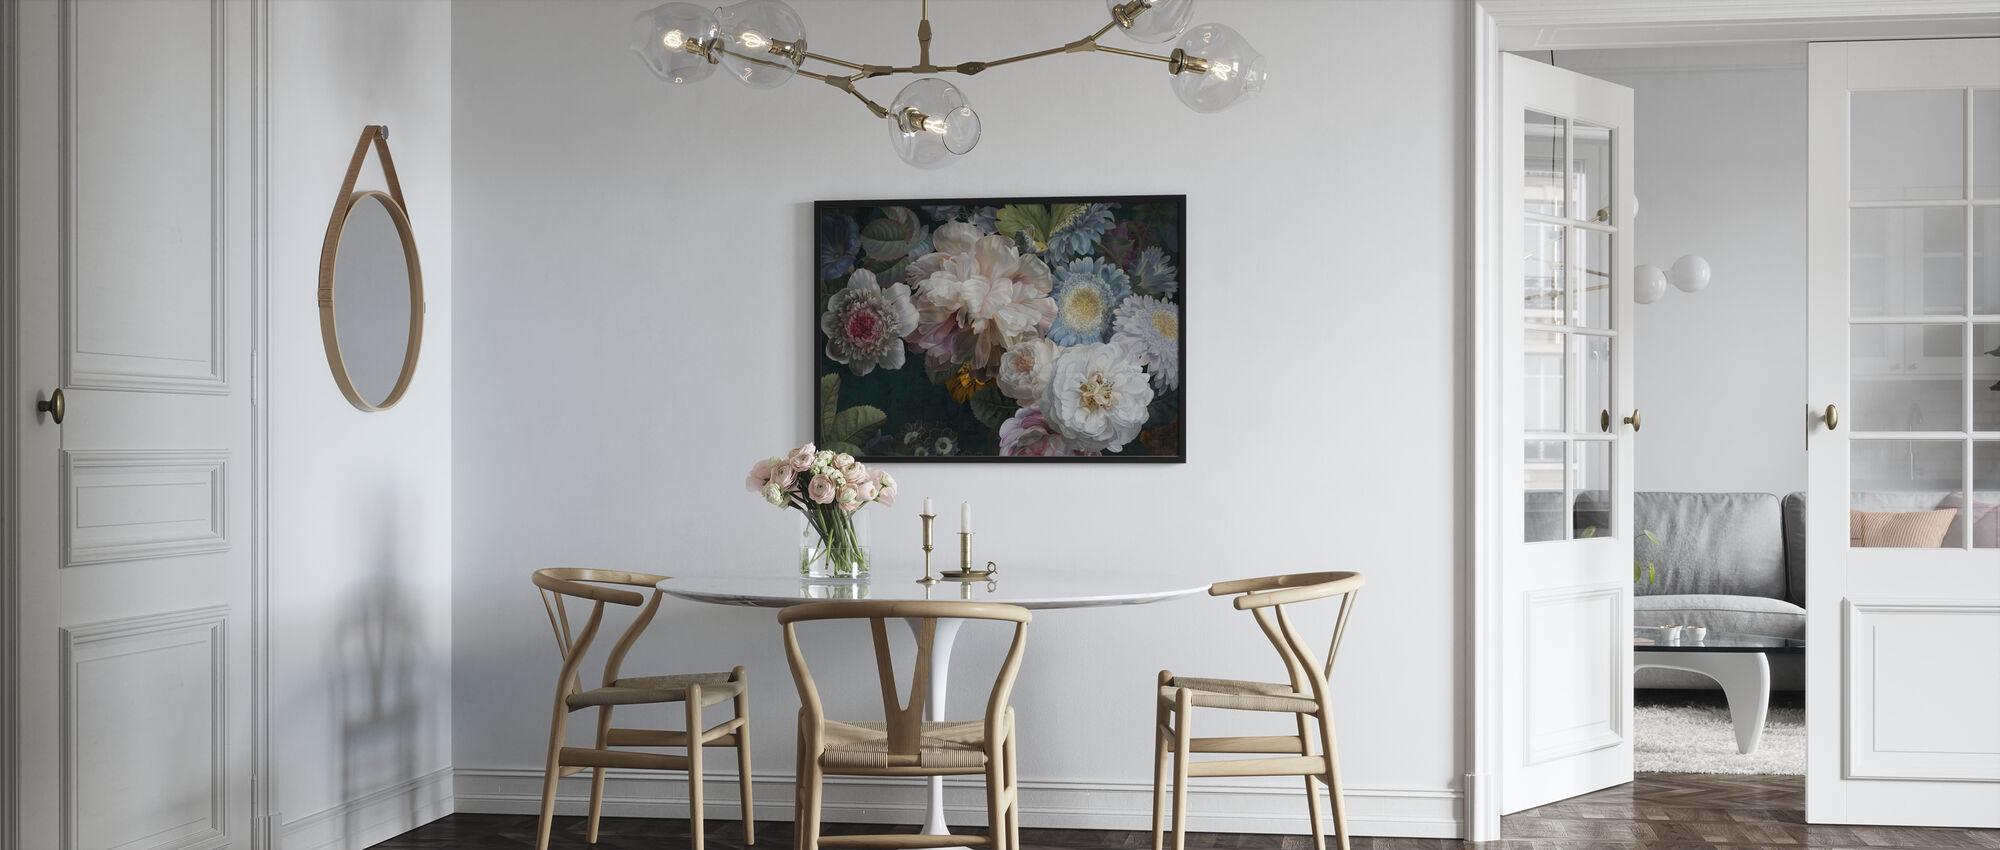 Lustre Arrangement - Poster - Küchen